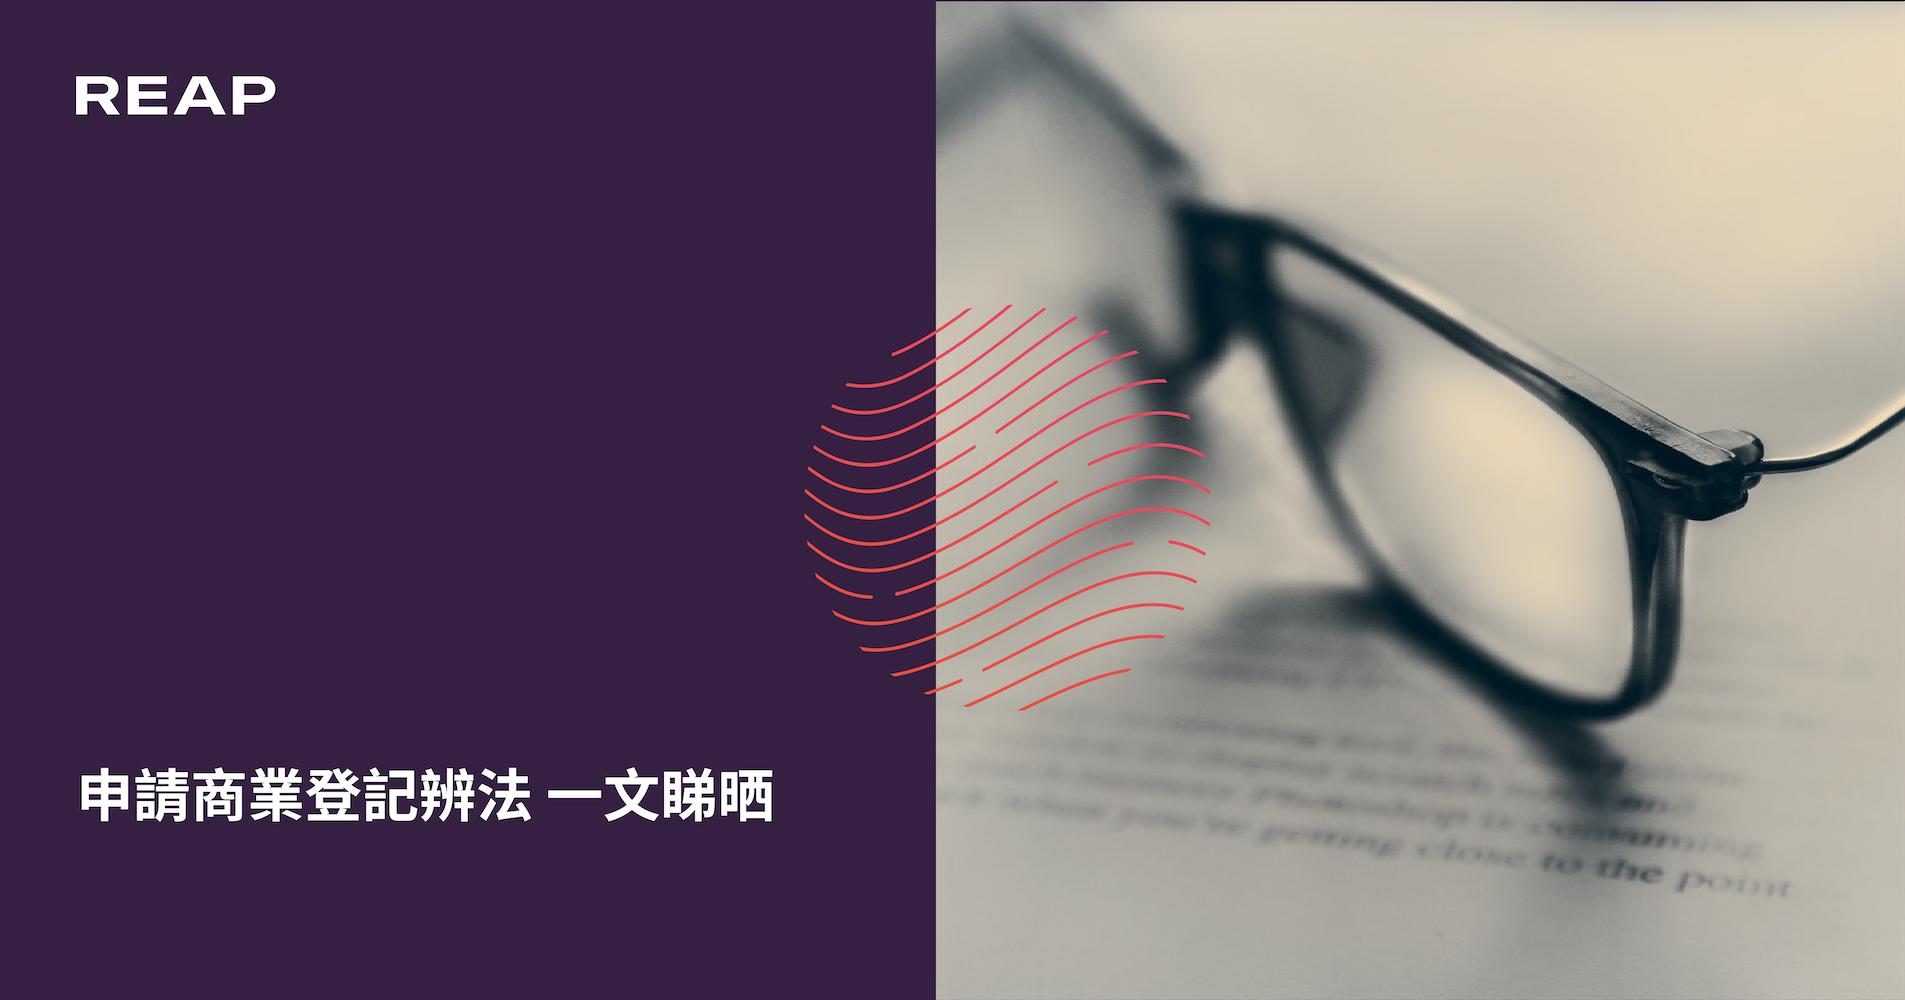 Cover Image for 申請商業登記辨法 一文睇晒